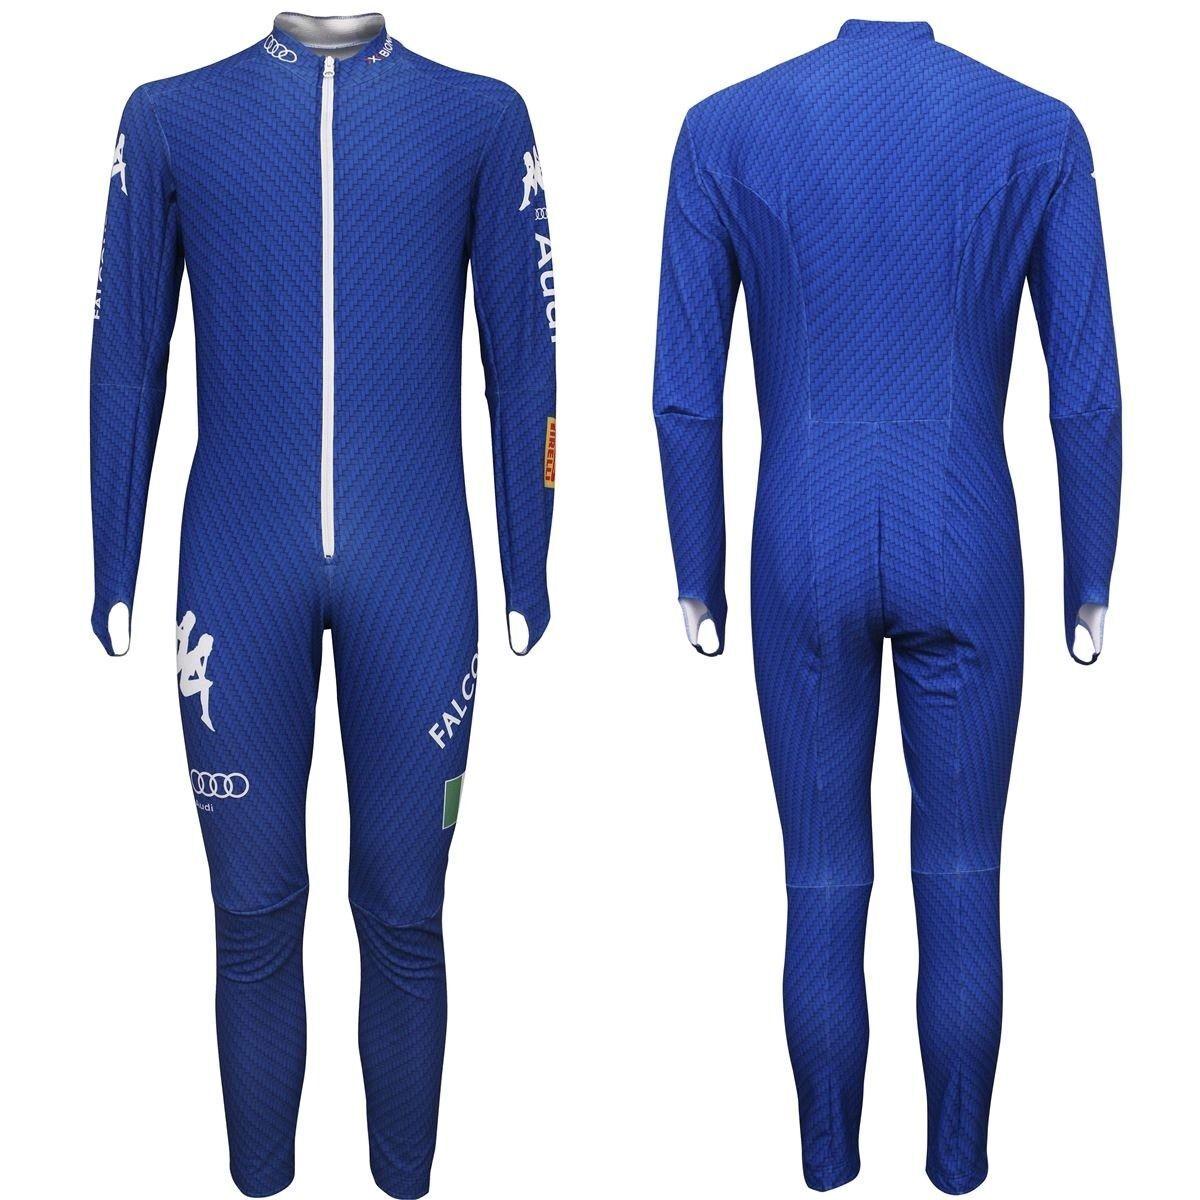 Kappa Ski Rennanzug Race Racing Speed Suit L Blau Neu Italia National Team SG DH